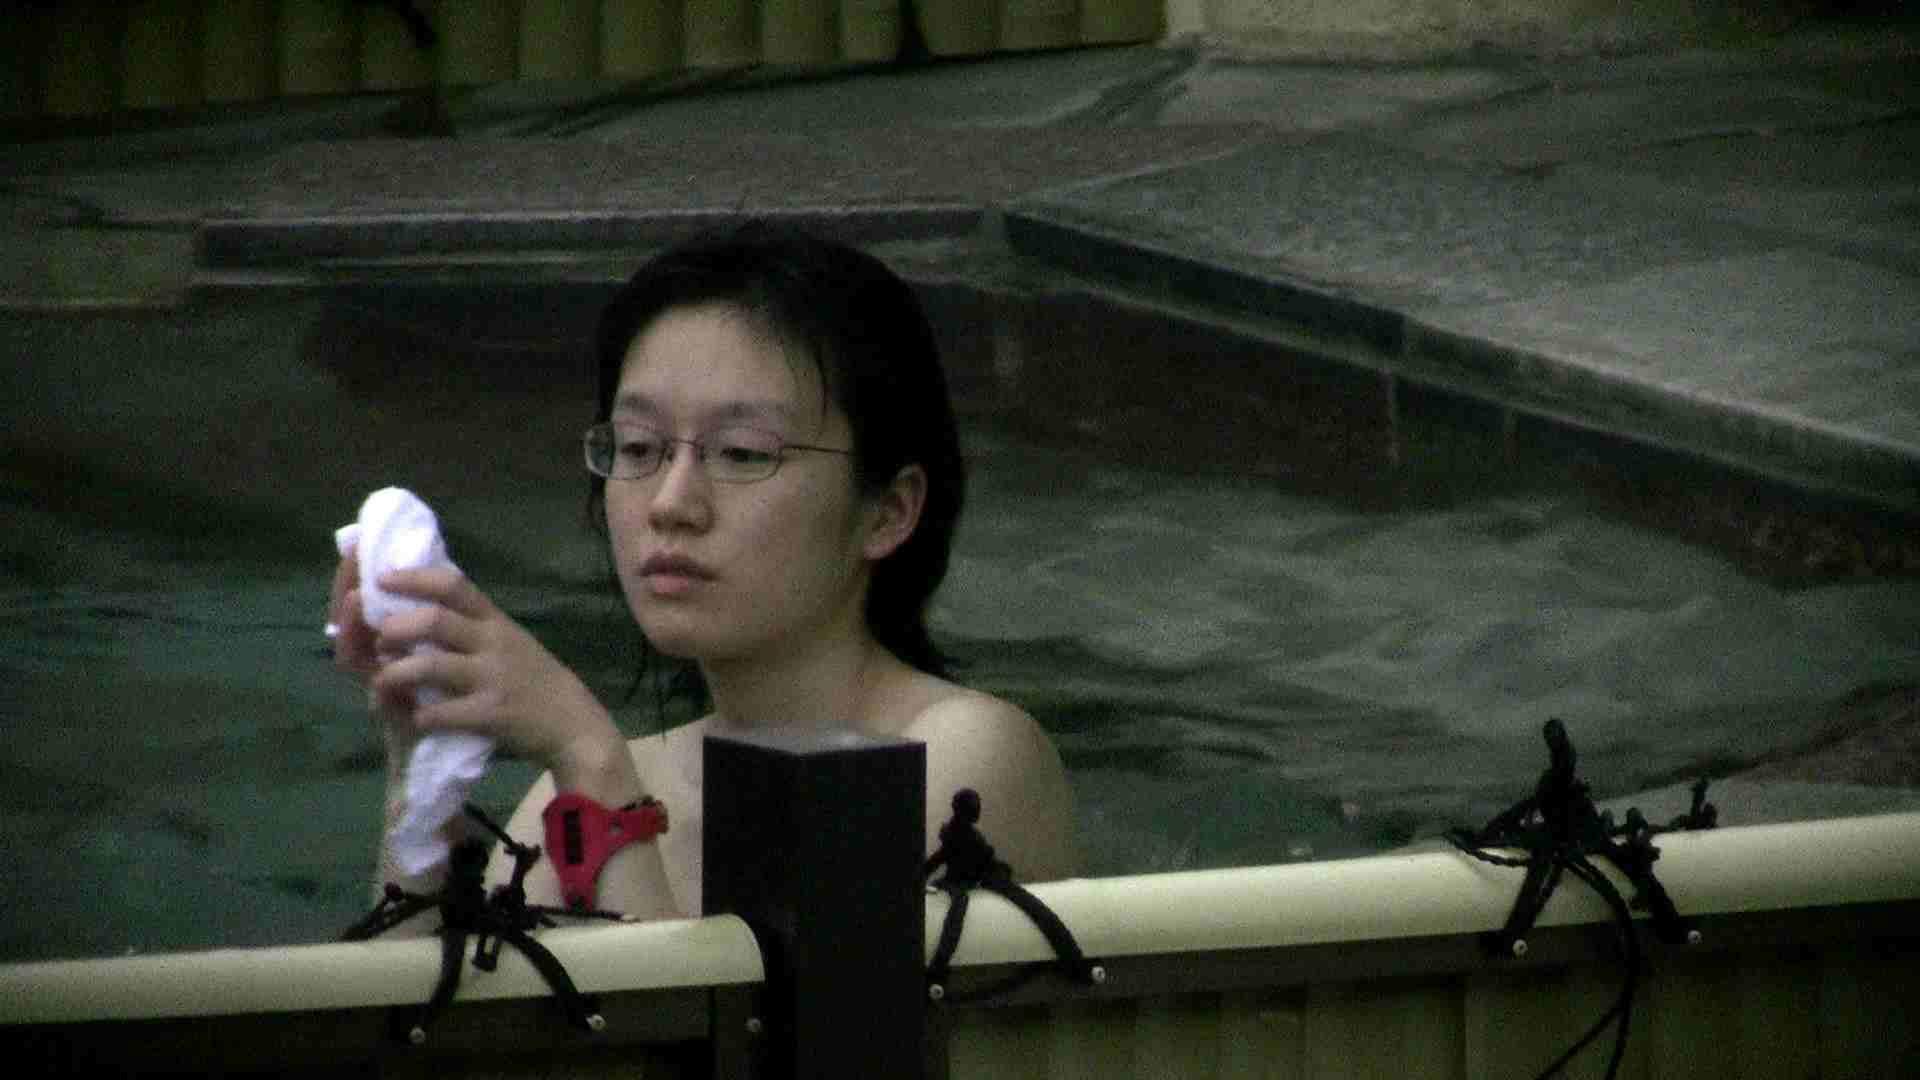 Aquaな露天風呂Vol.684 HなOL オメコ動画キャプチャ 87pic 26